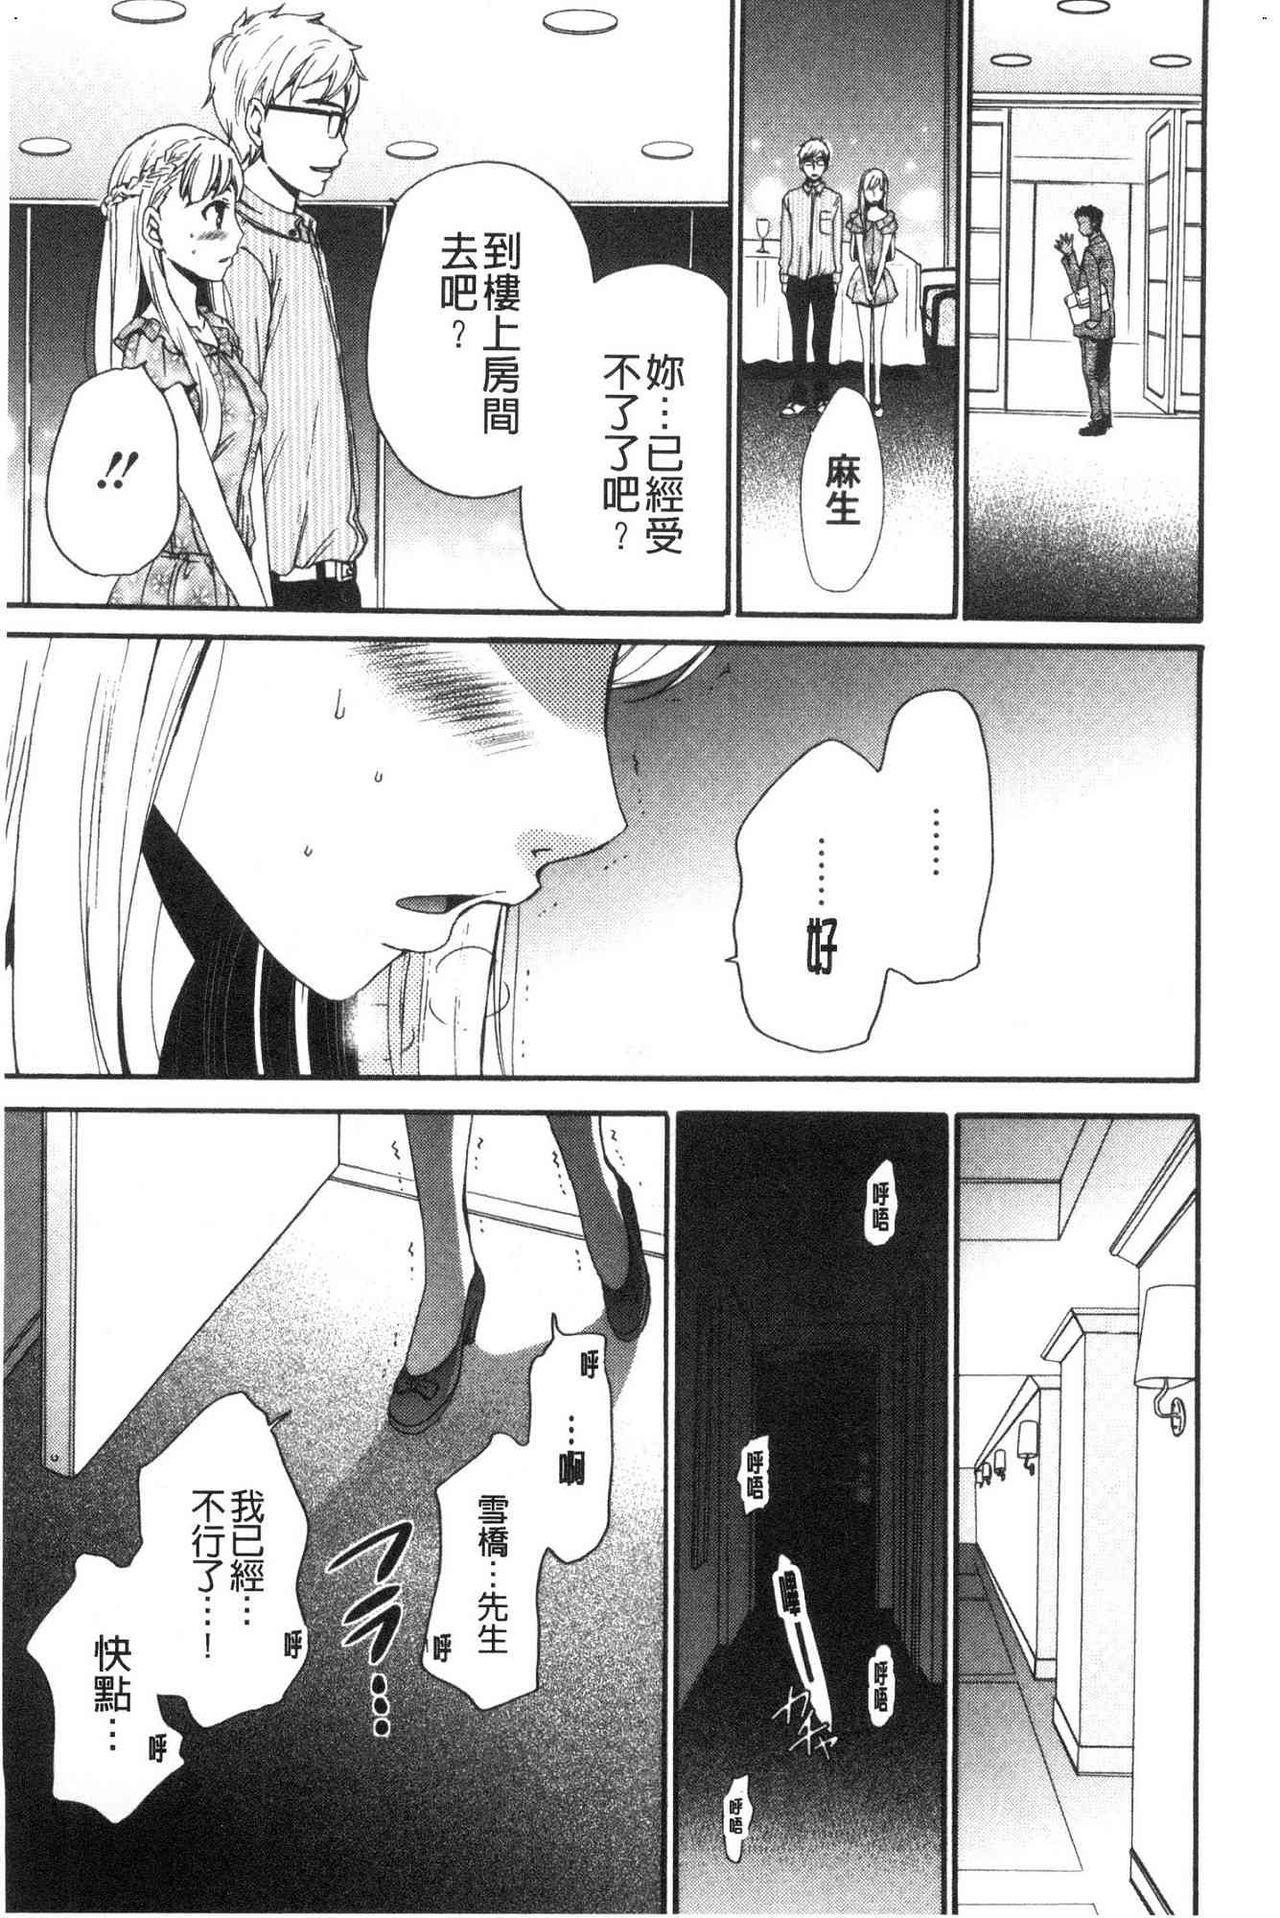 [Gotoh Akira]  21-ji no Onna ~Camera no Mae no Mesuinu~ 2 | 21時之女 ~鏡頭前的牝犬~ 2 [Chinese] 12